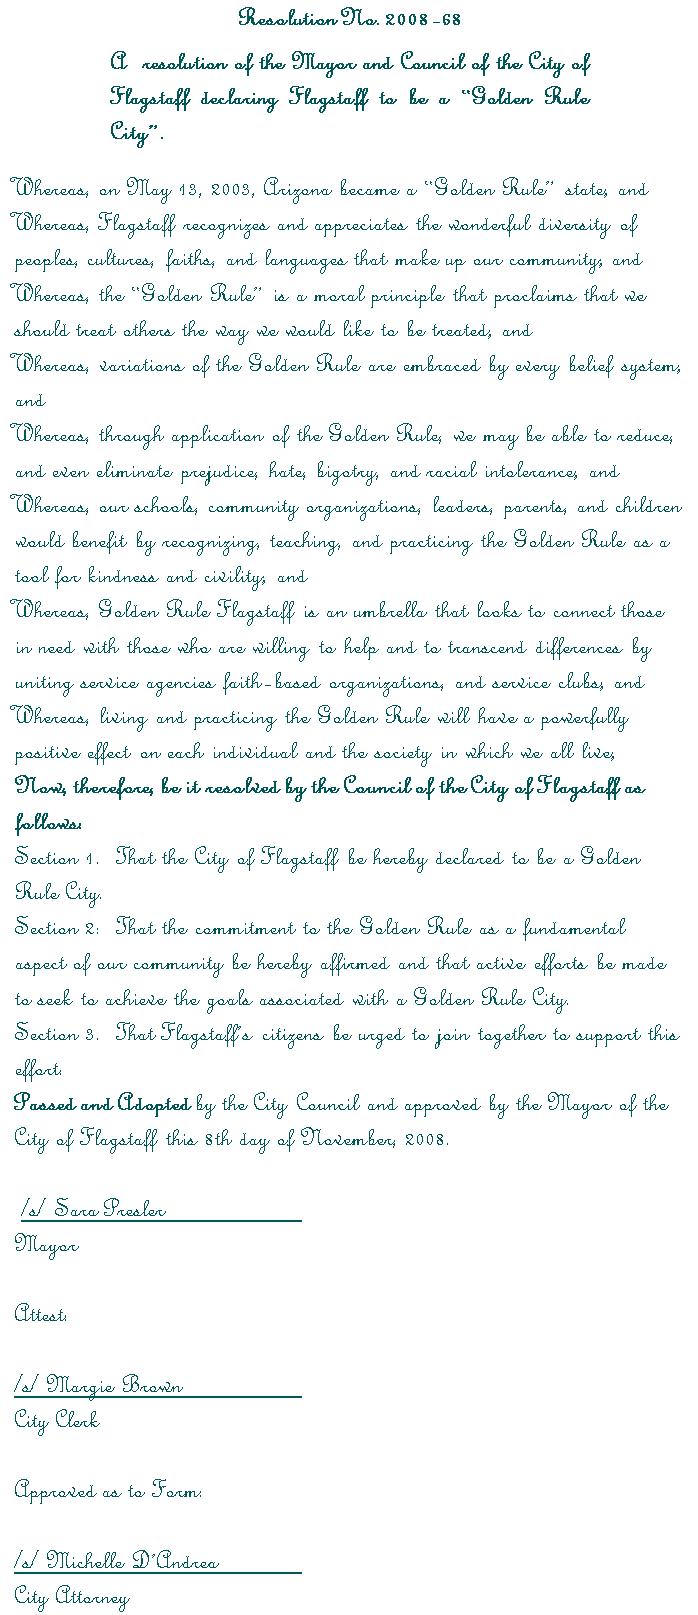 Golden Rule Resolution - Smaller